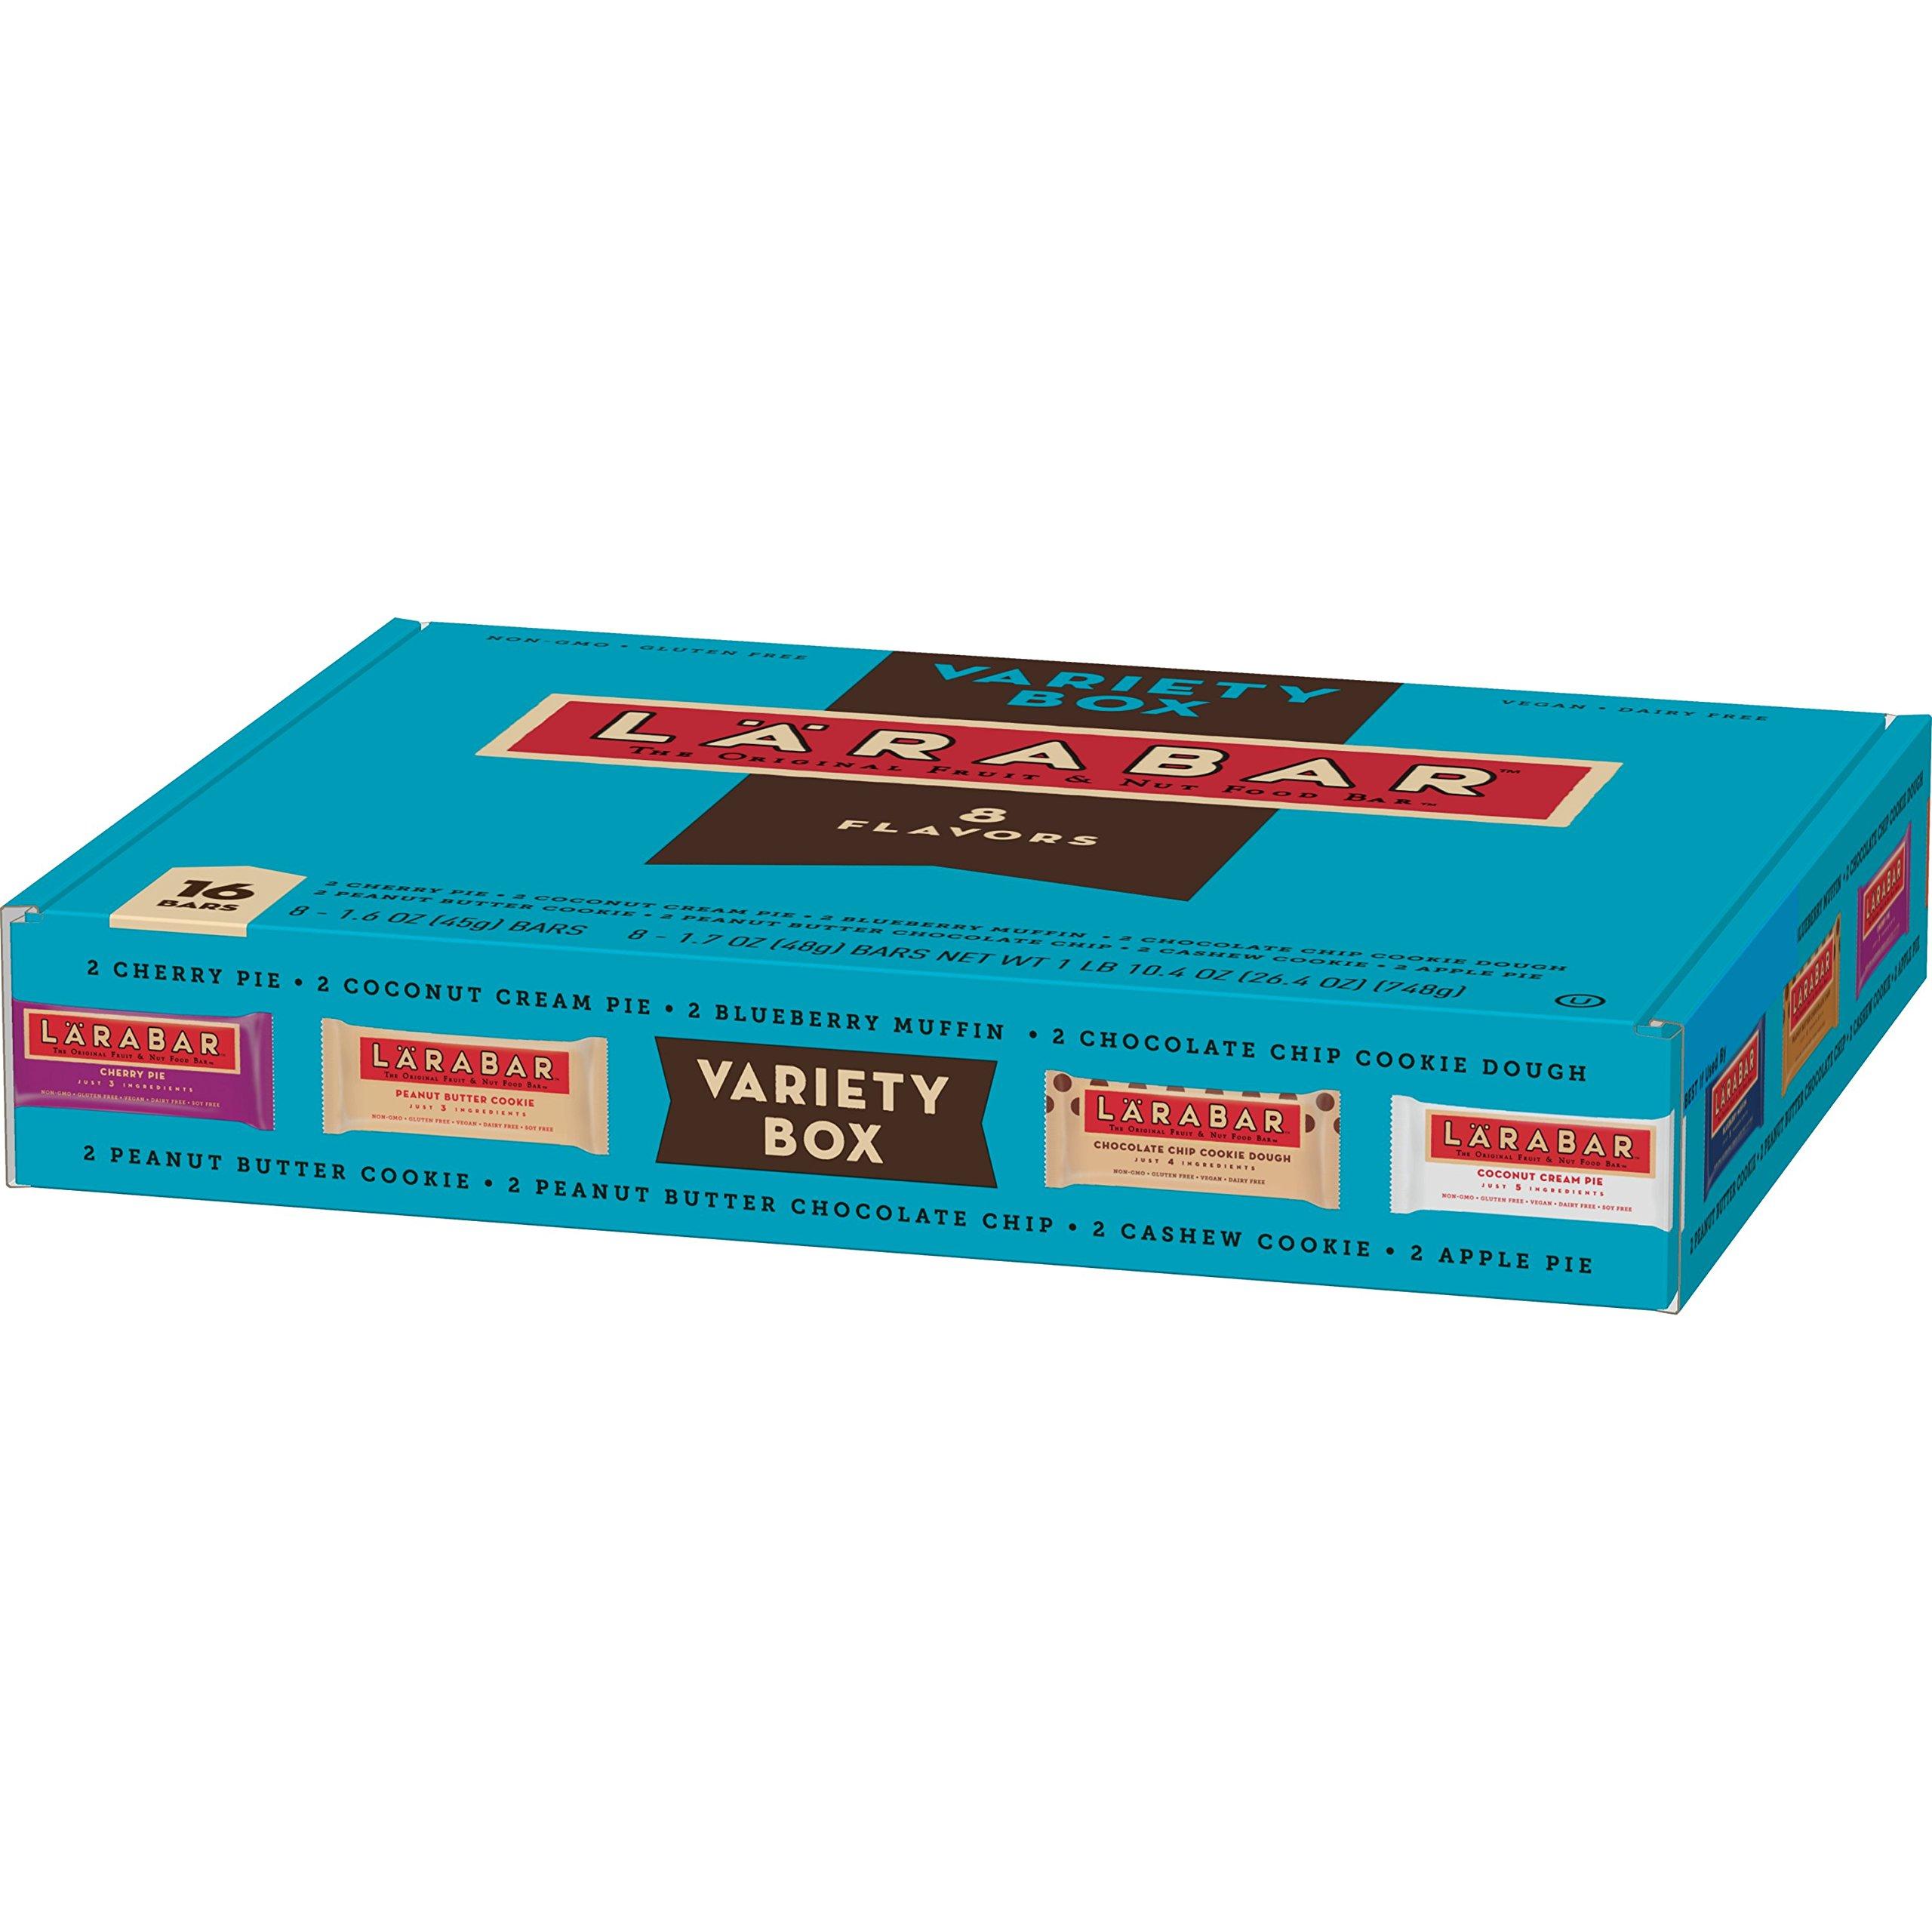 LARABAR, Fruit & Nut Bar, Snack Bar Variety Box, Gift Pack, Gluten Free, Vegan, 8 Assorted Flavors (16 Count), Net wt. 26.4 oz